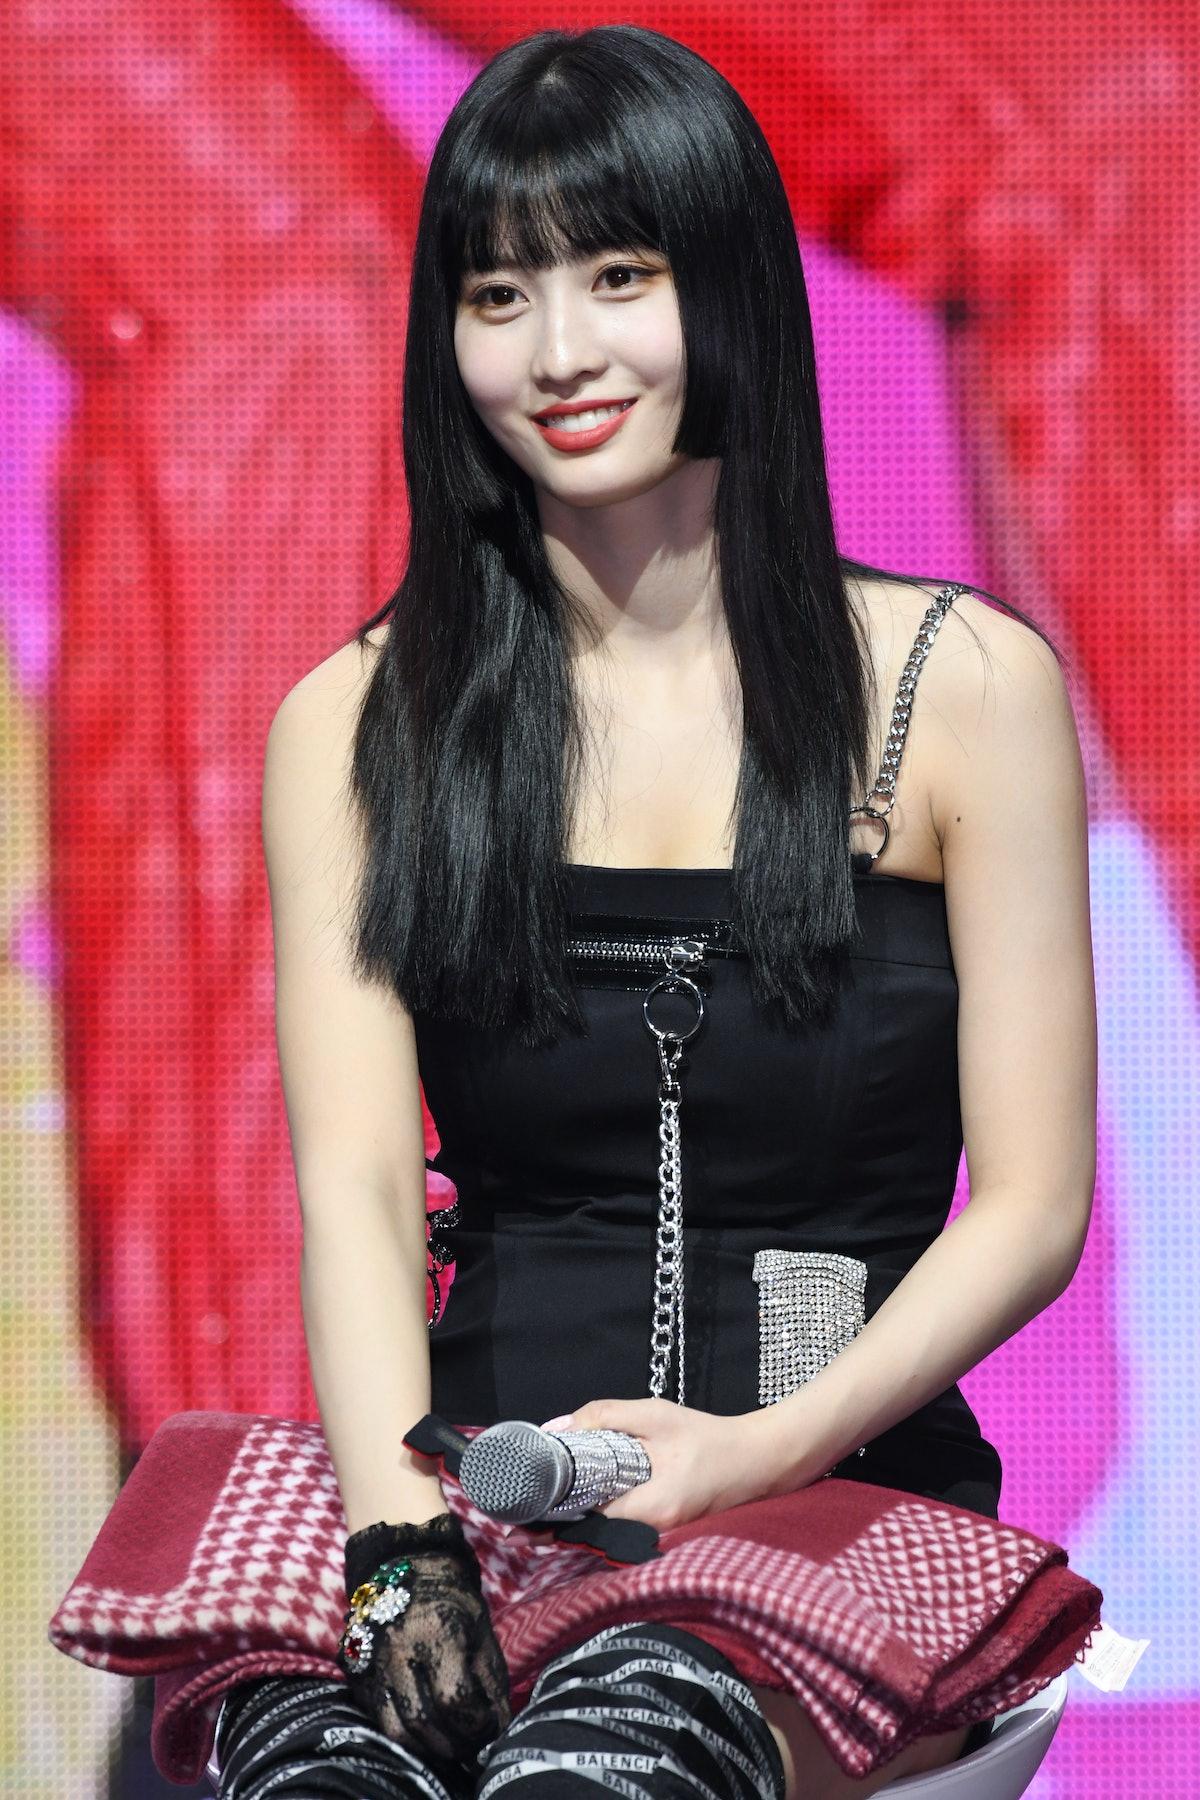 SEOUL, SOUTH KOREA - APRIL 22: Momo of TWICE attends TWICE's 7th Mini Album 'FANCY YOU' Release Showcase at Yes24 Live Hall on April 22, 2019 in Seoul, South Korea. (Photo by The Chosunilbo JNS/Imazins via Getty Images)